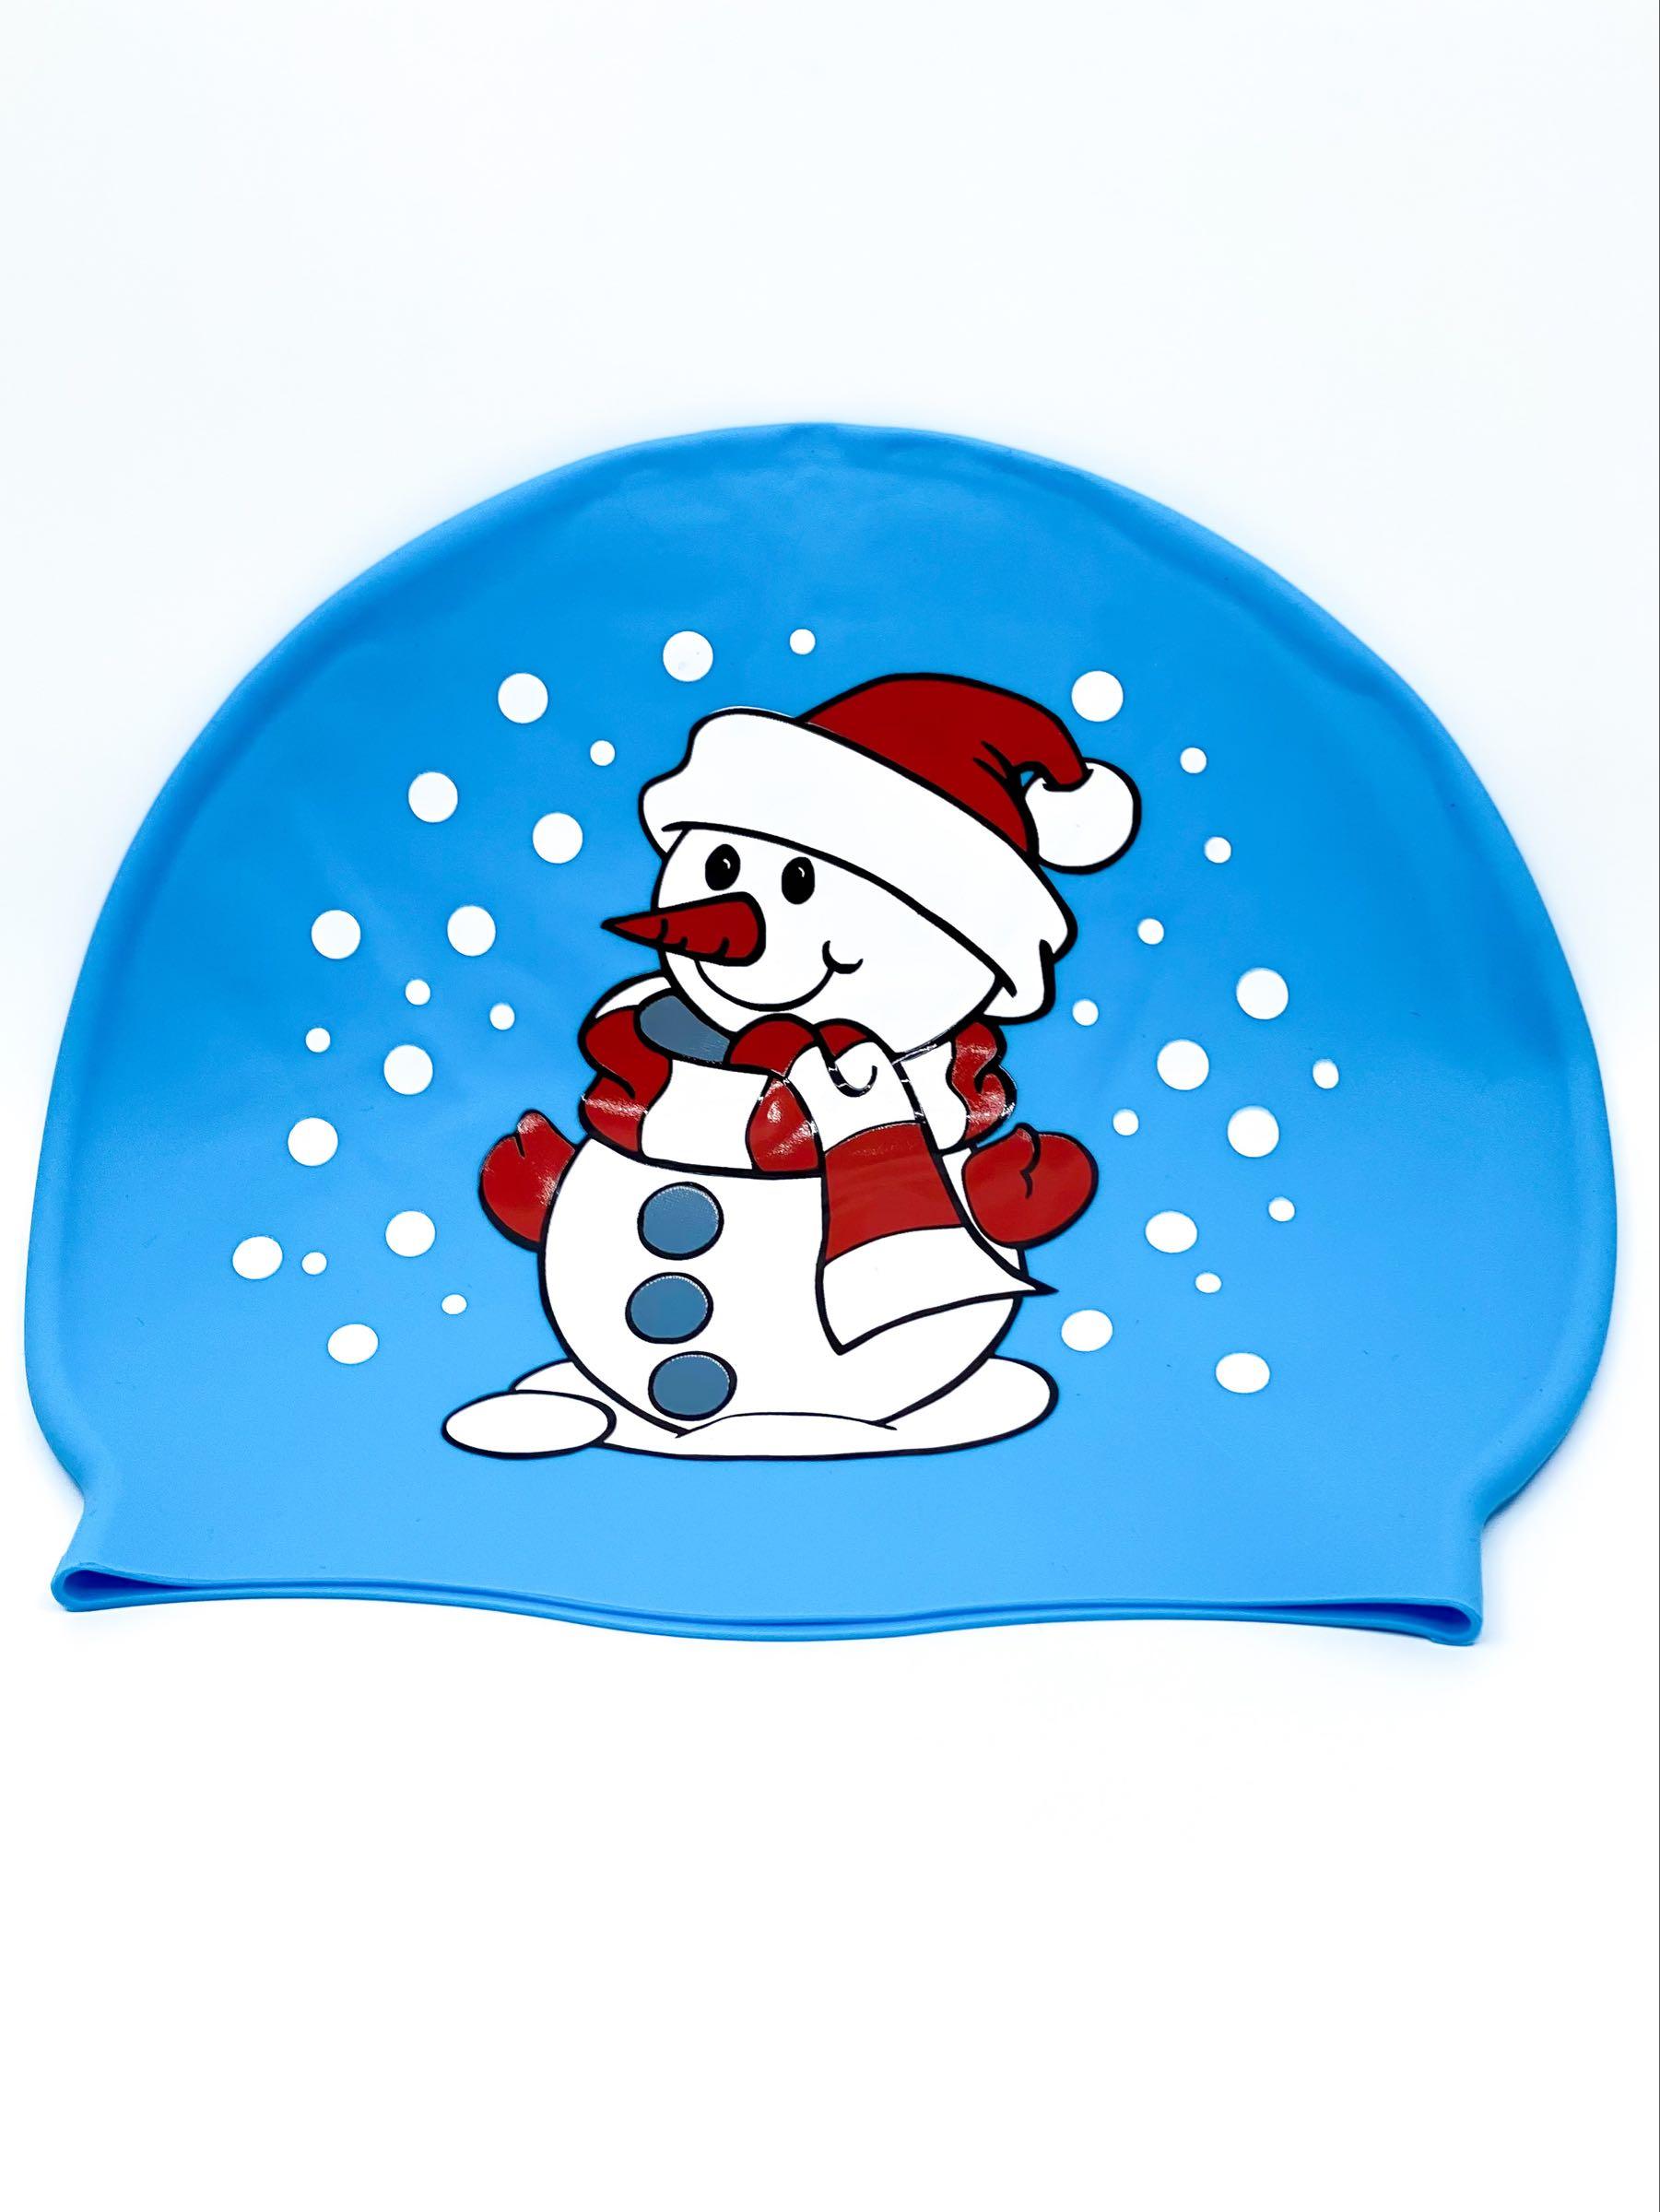 Svømmehette Julemotiv